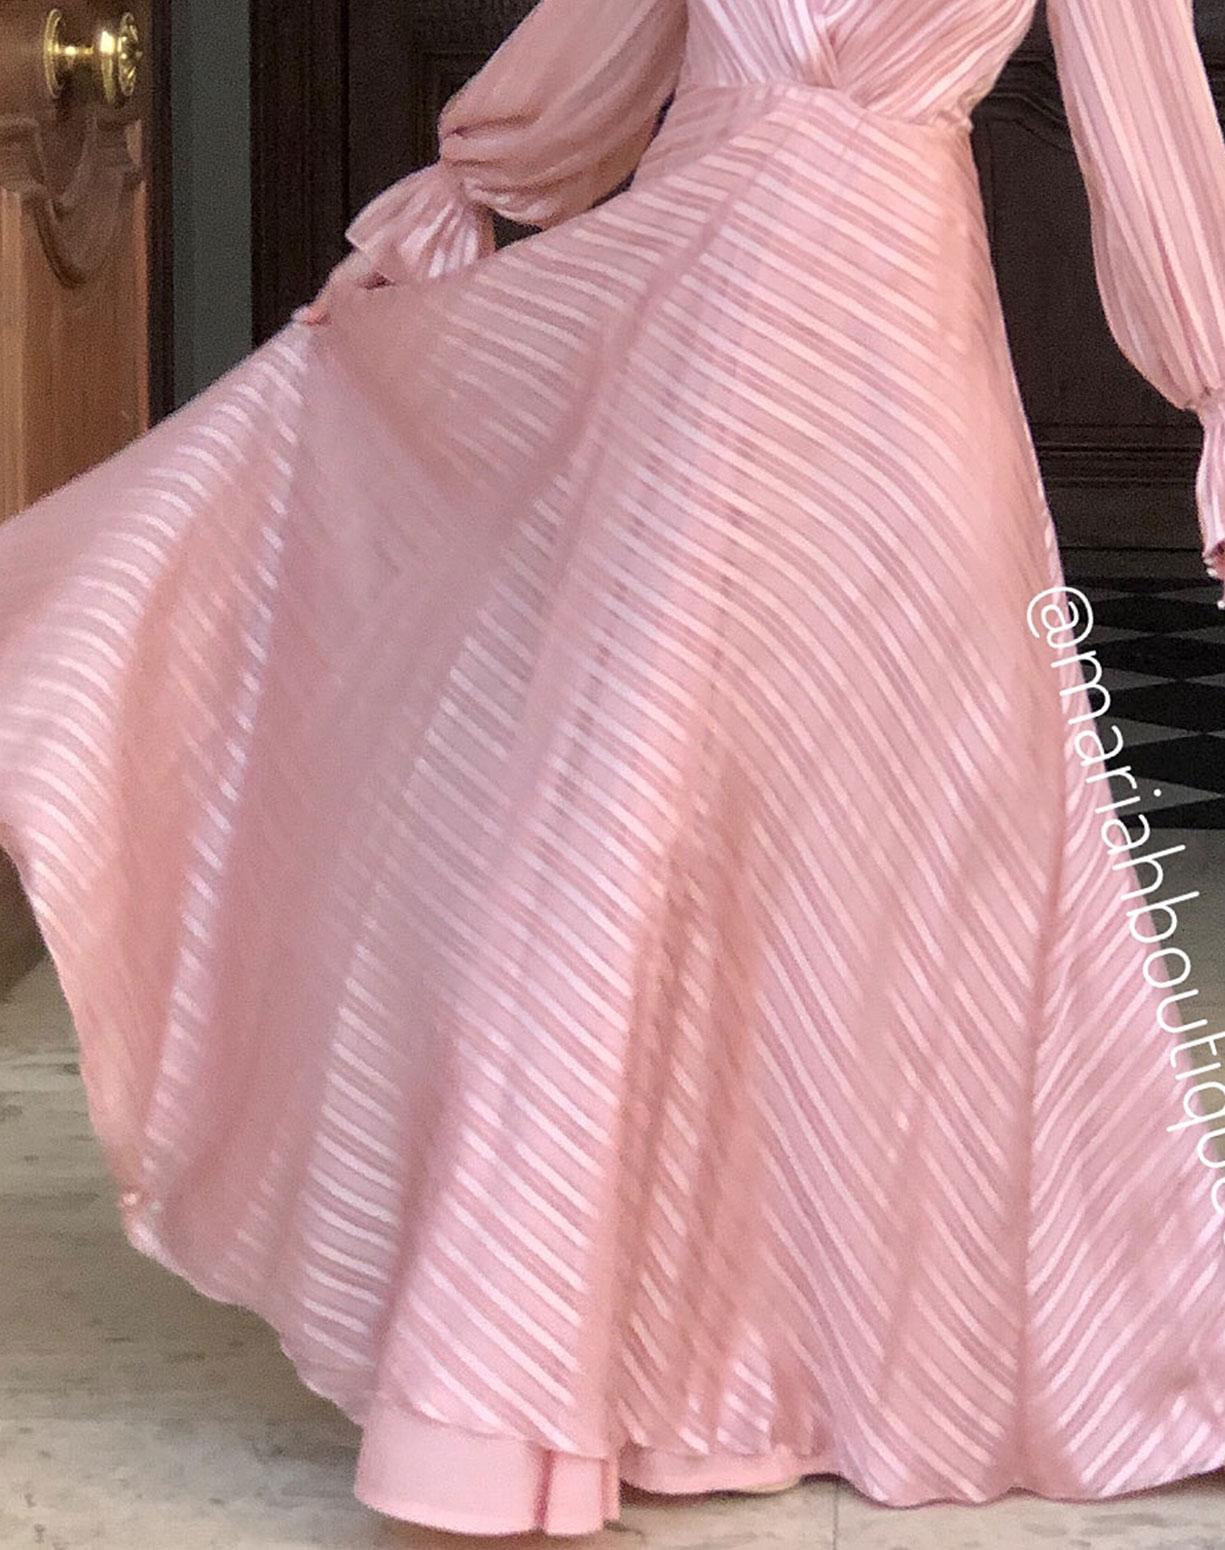 Vestido Nude Listras em Seda